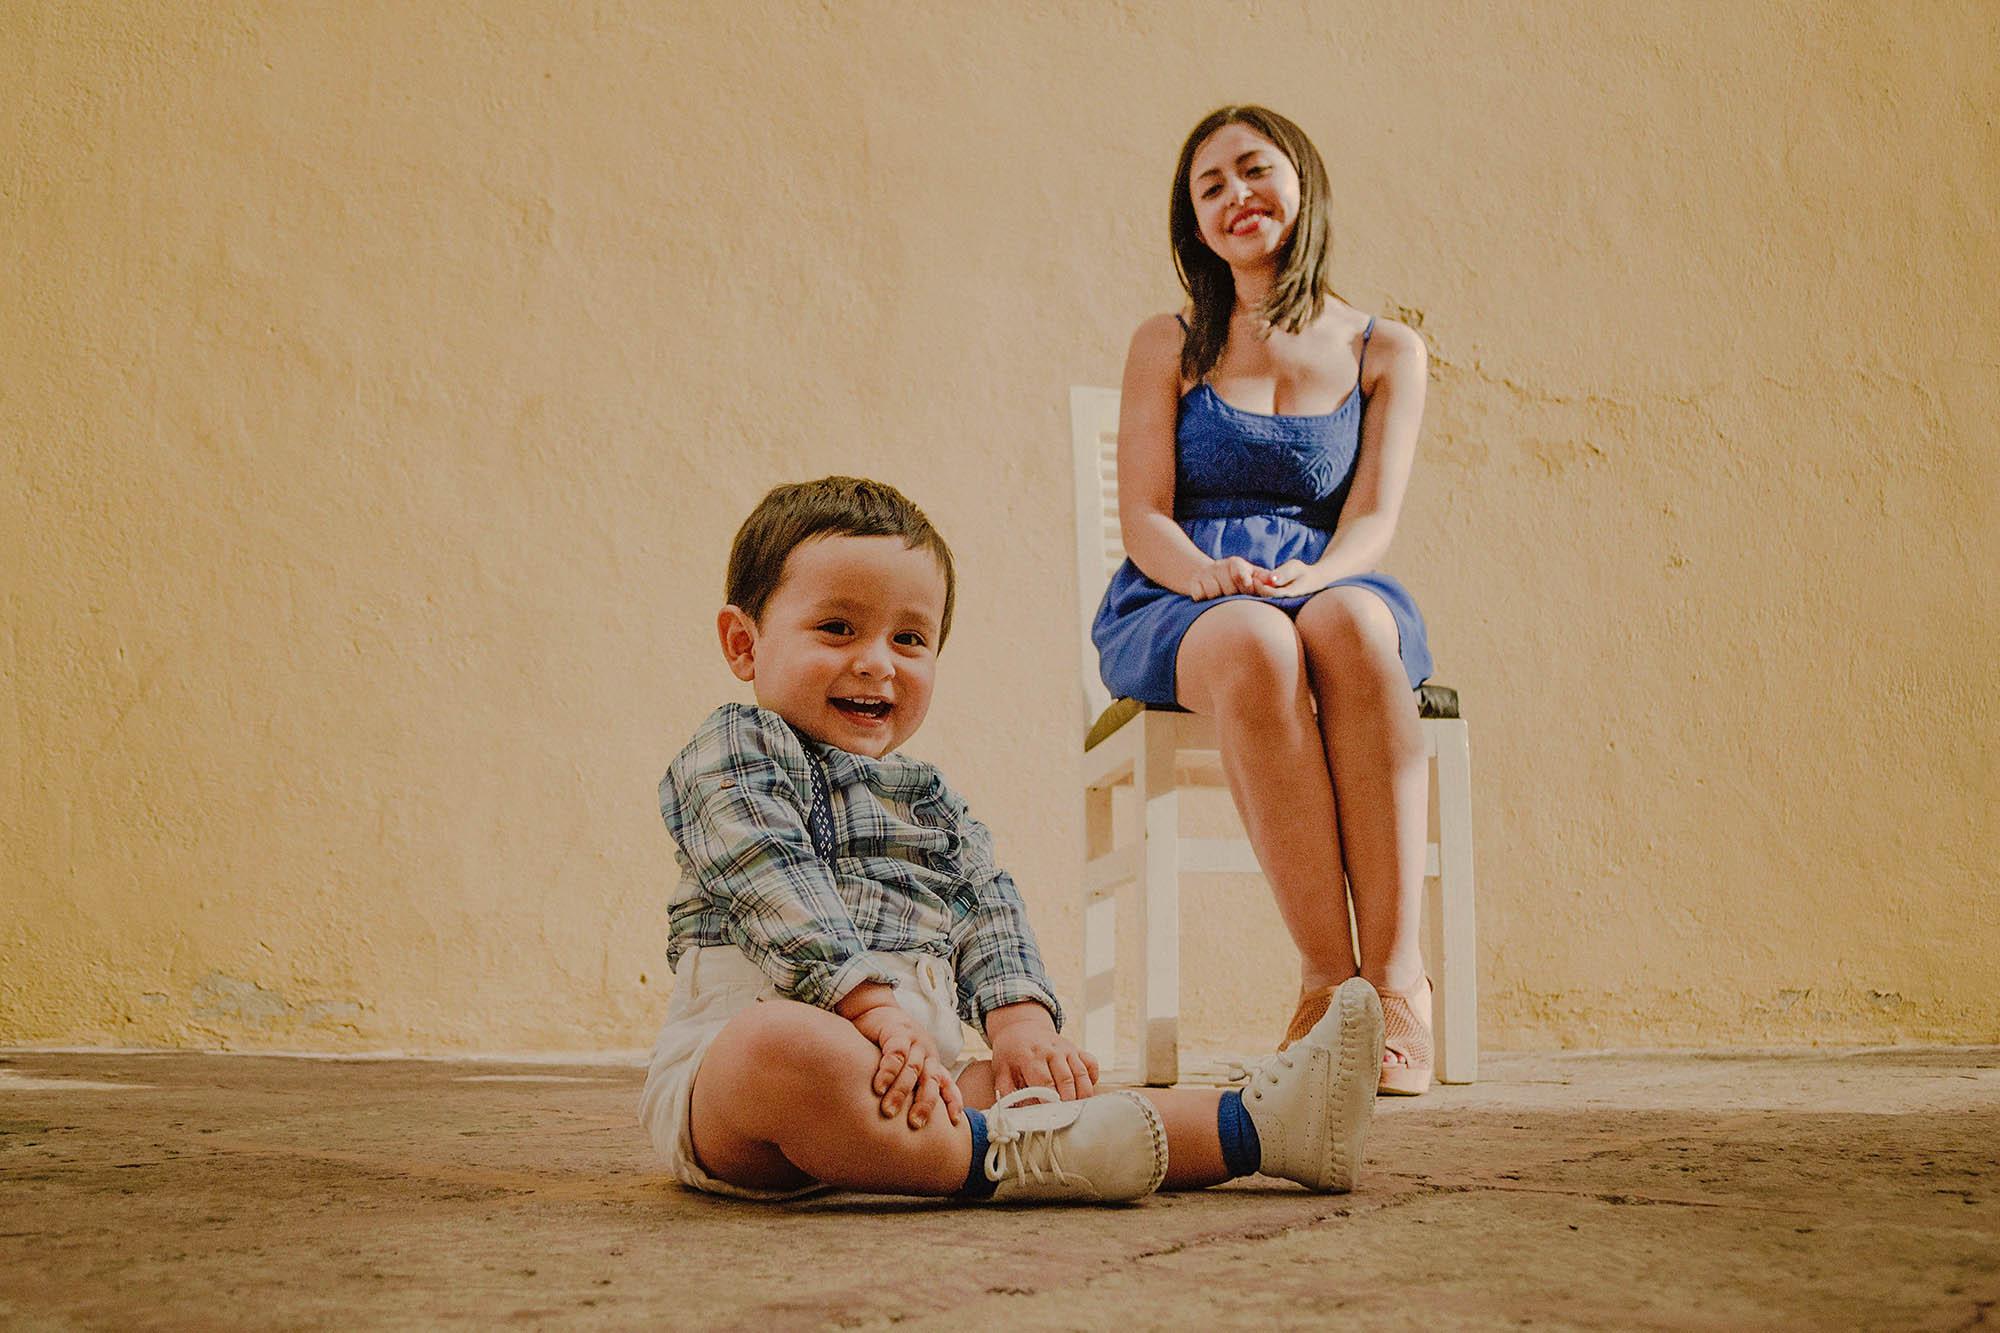 fotografo-de-familia-Queretaro-Daniela-Sohe-3.jpg